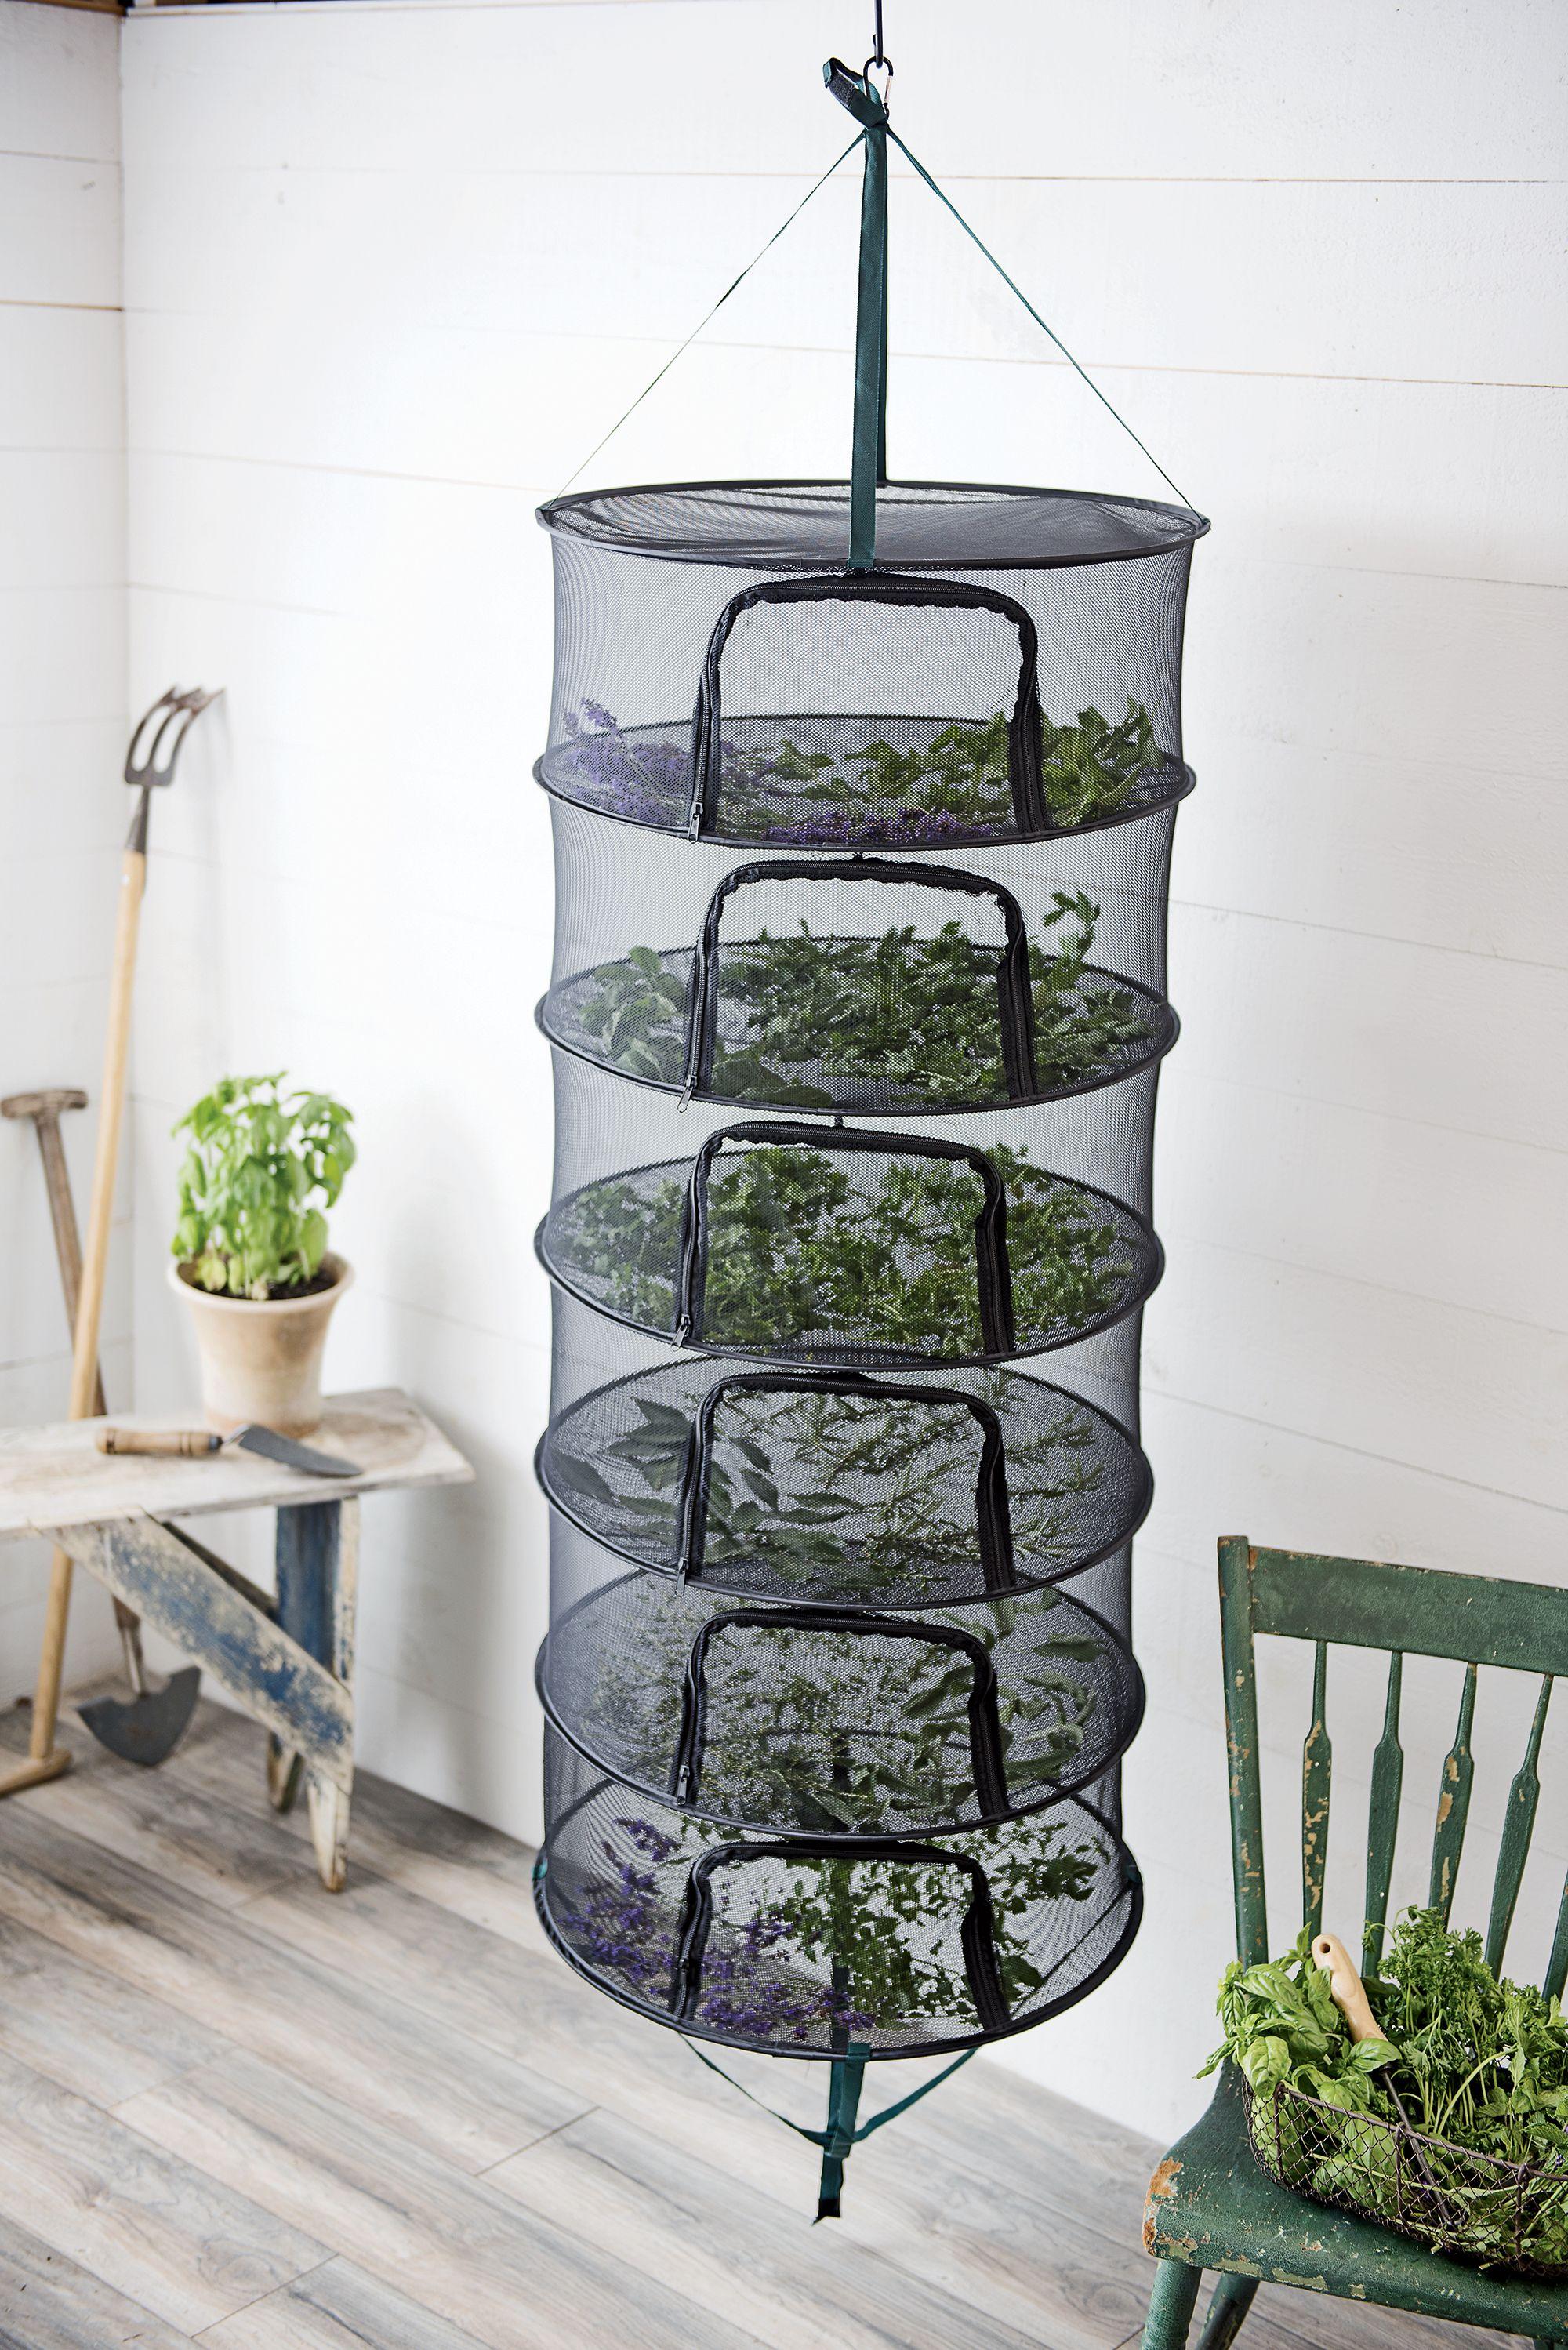 Stack T Herb Drying Rack Gardener S Supply Herb Drying Racks Drying Herbs Garden Supplies